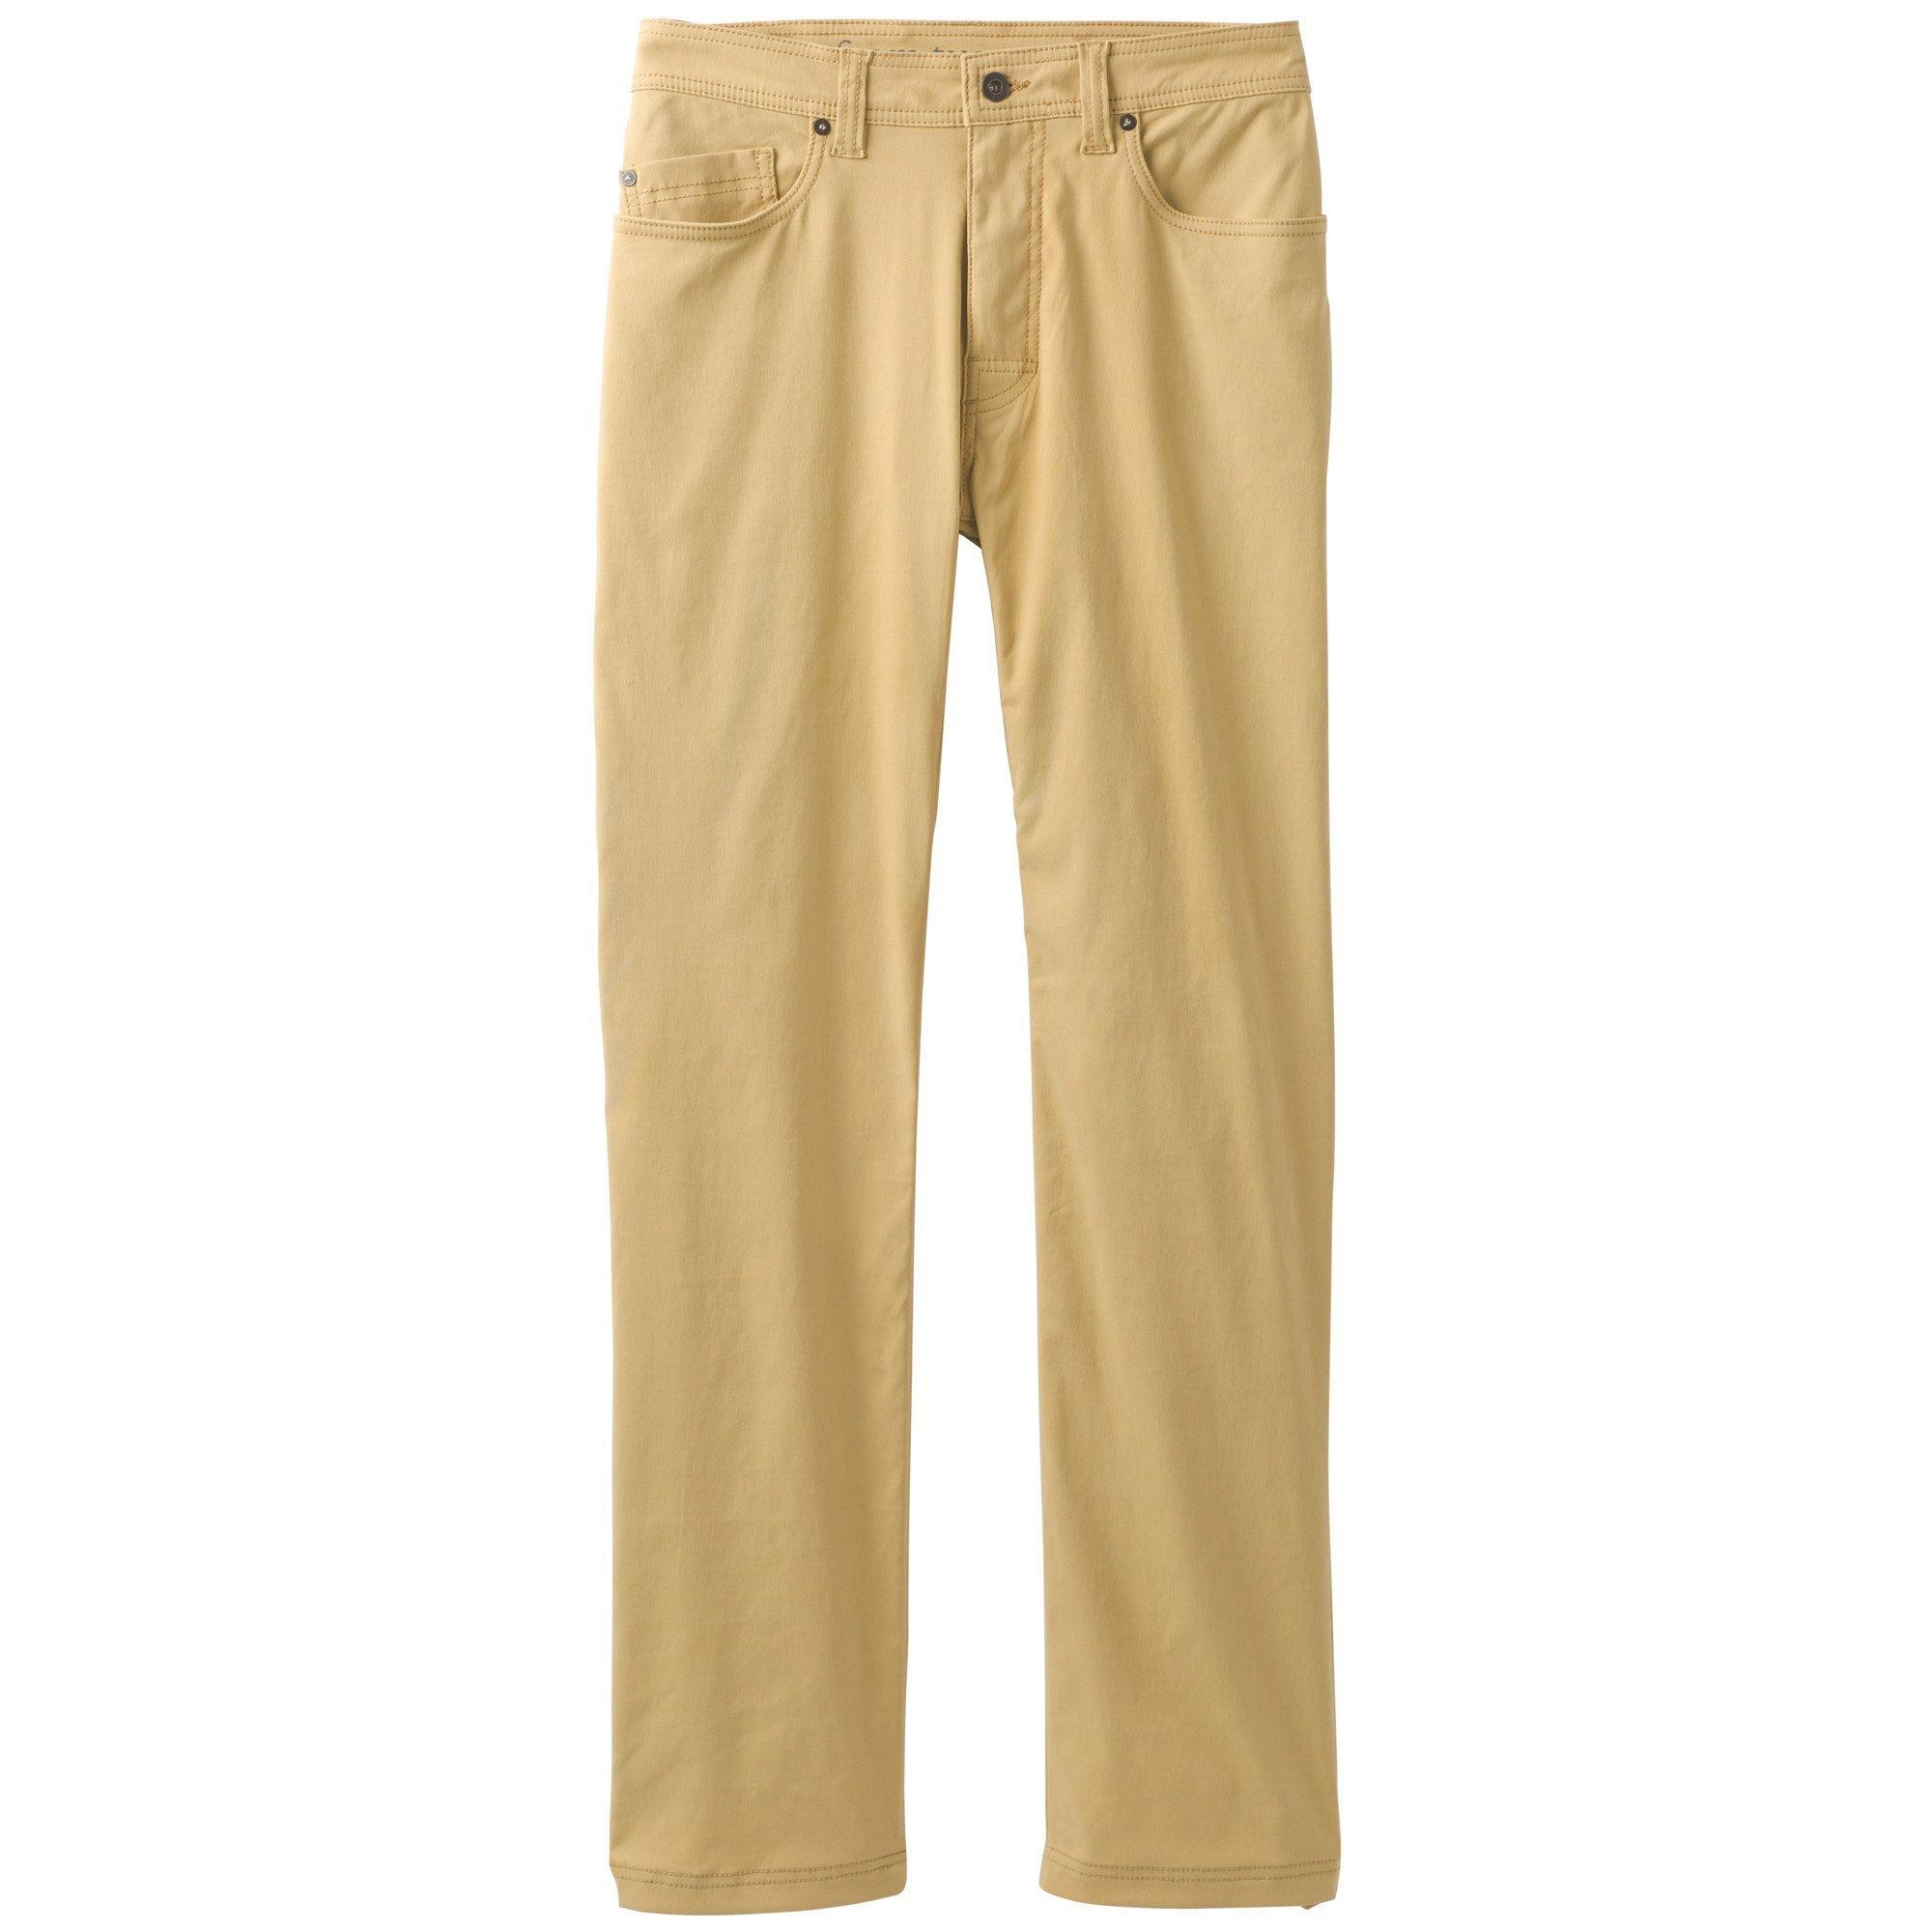 prAna Brion Pants 32'' Inseam Pants, Sandpiper, Size 38